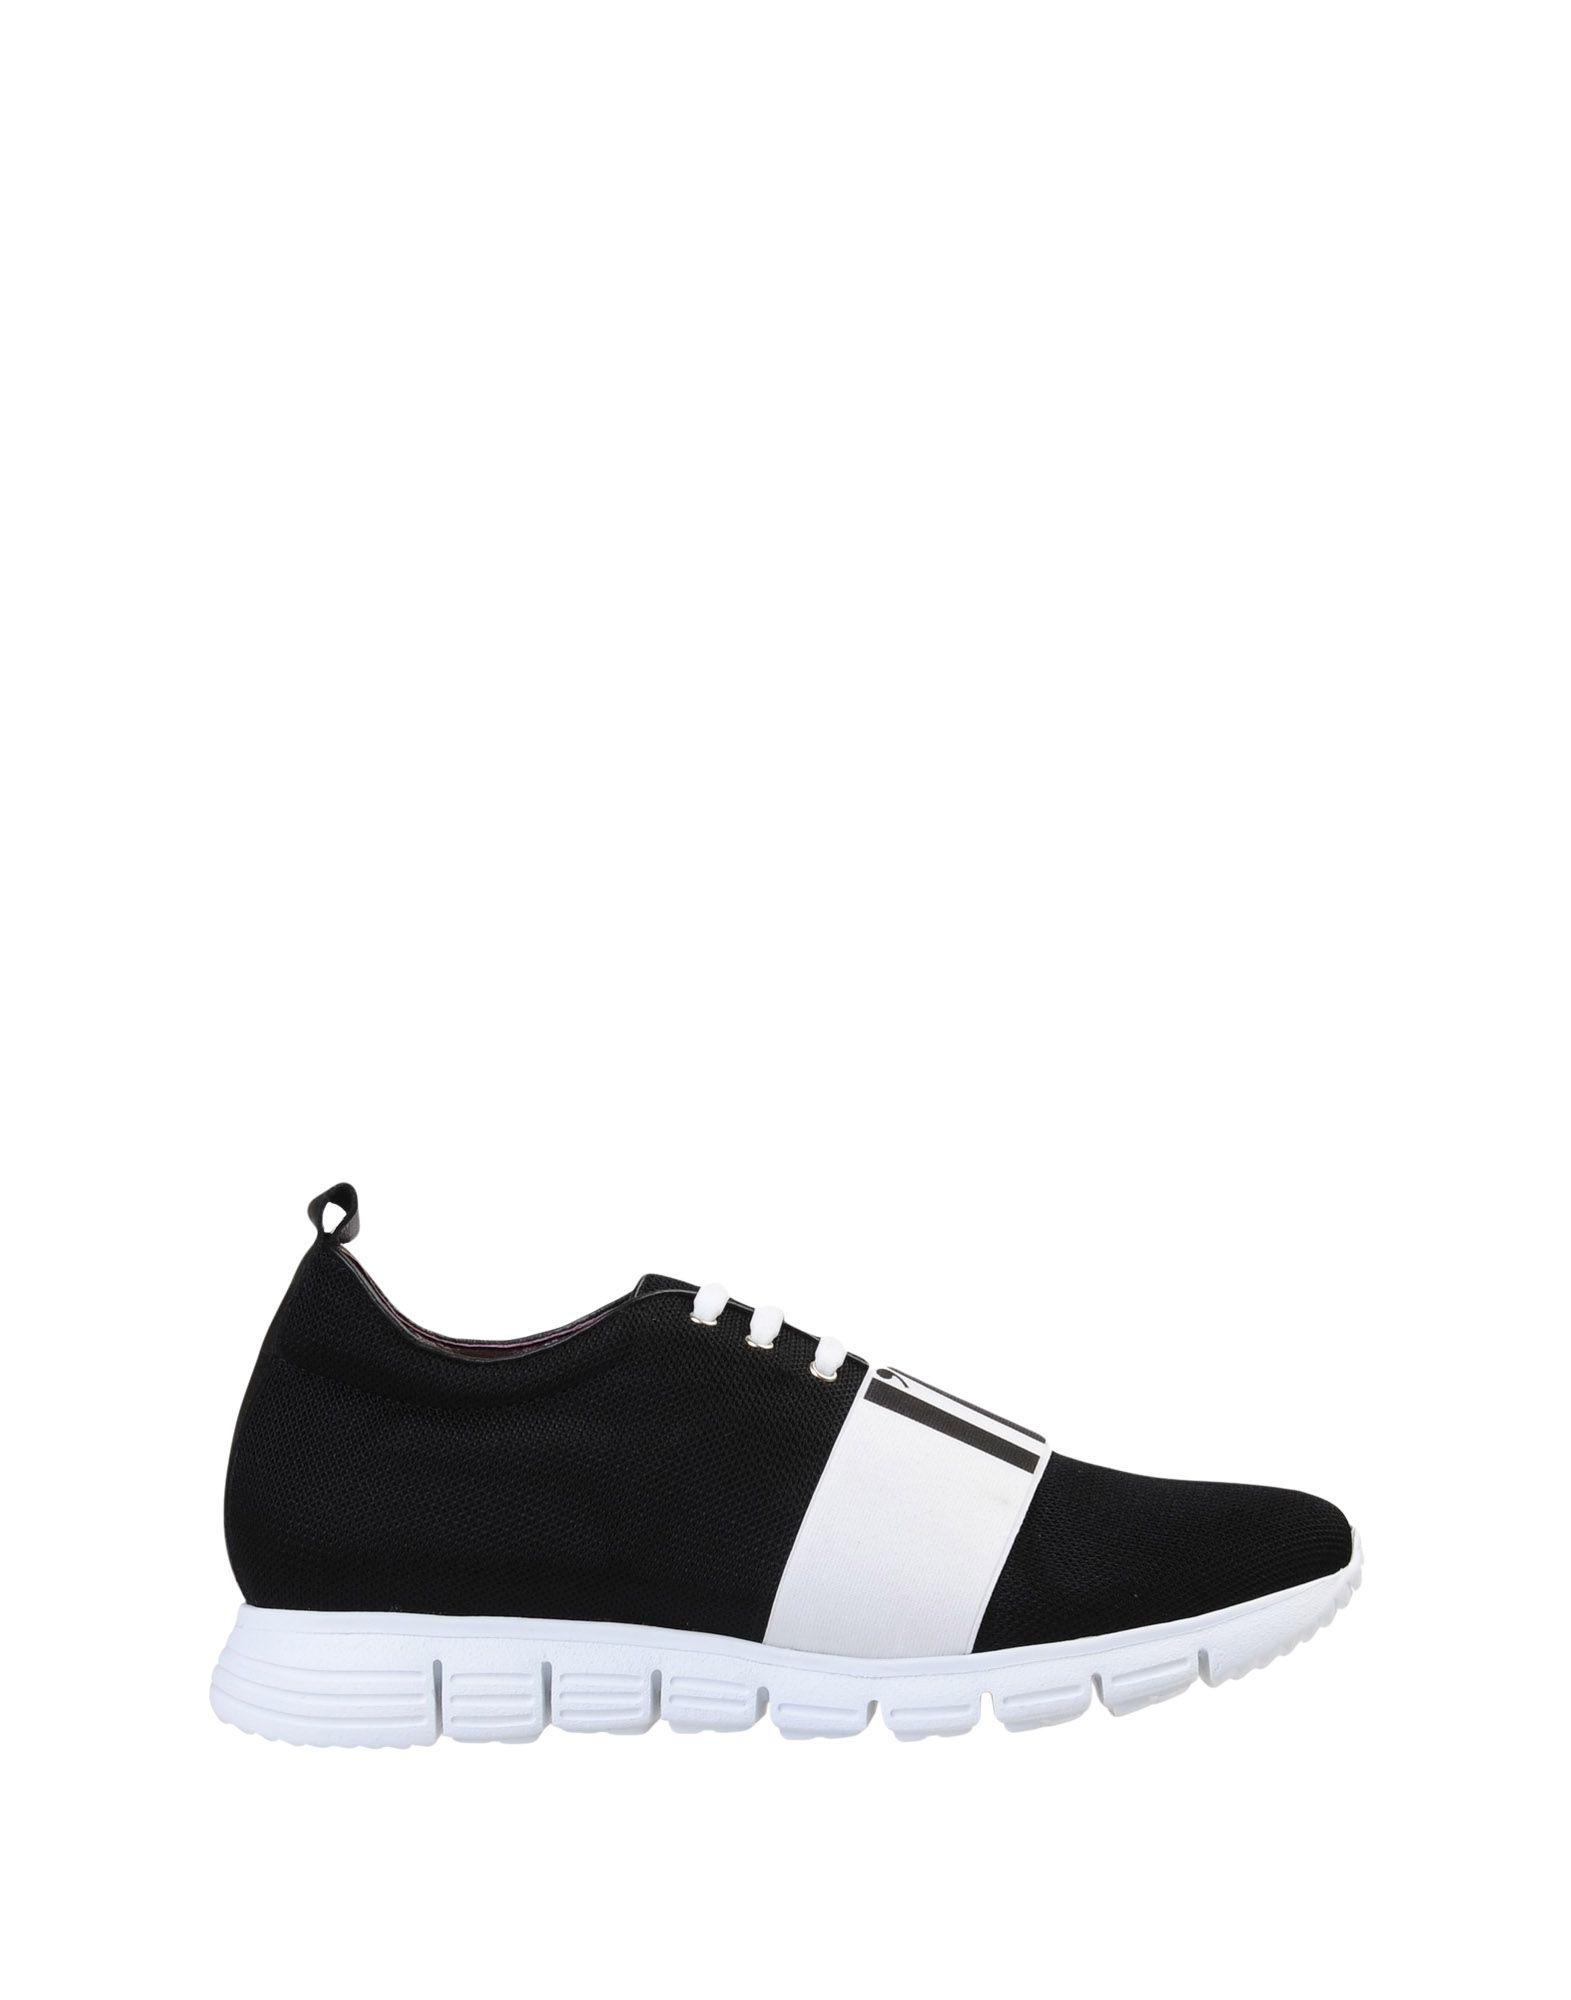 Sneakers Im Isola Marras Femme - Sneakers Im Isola Marras sur